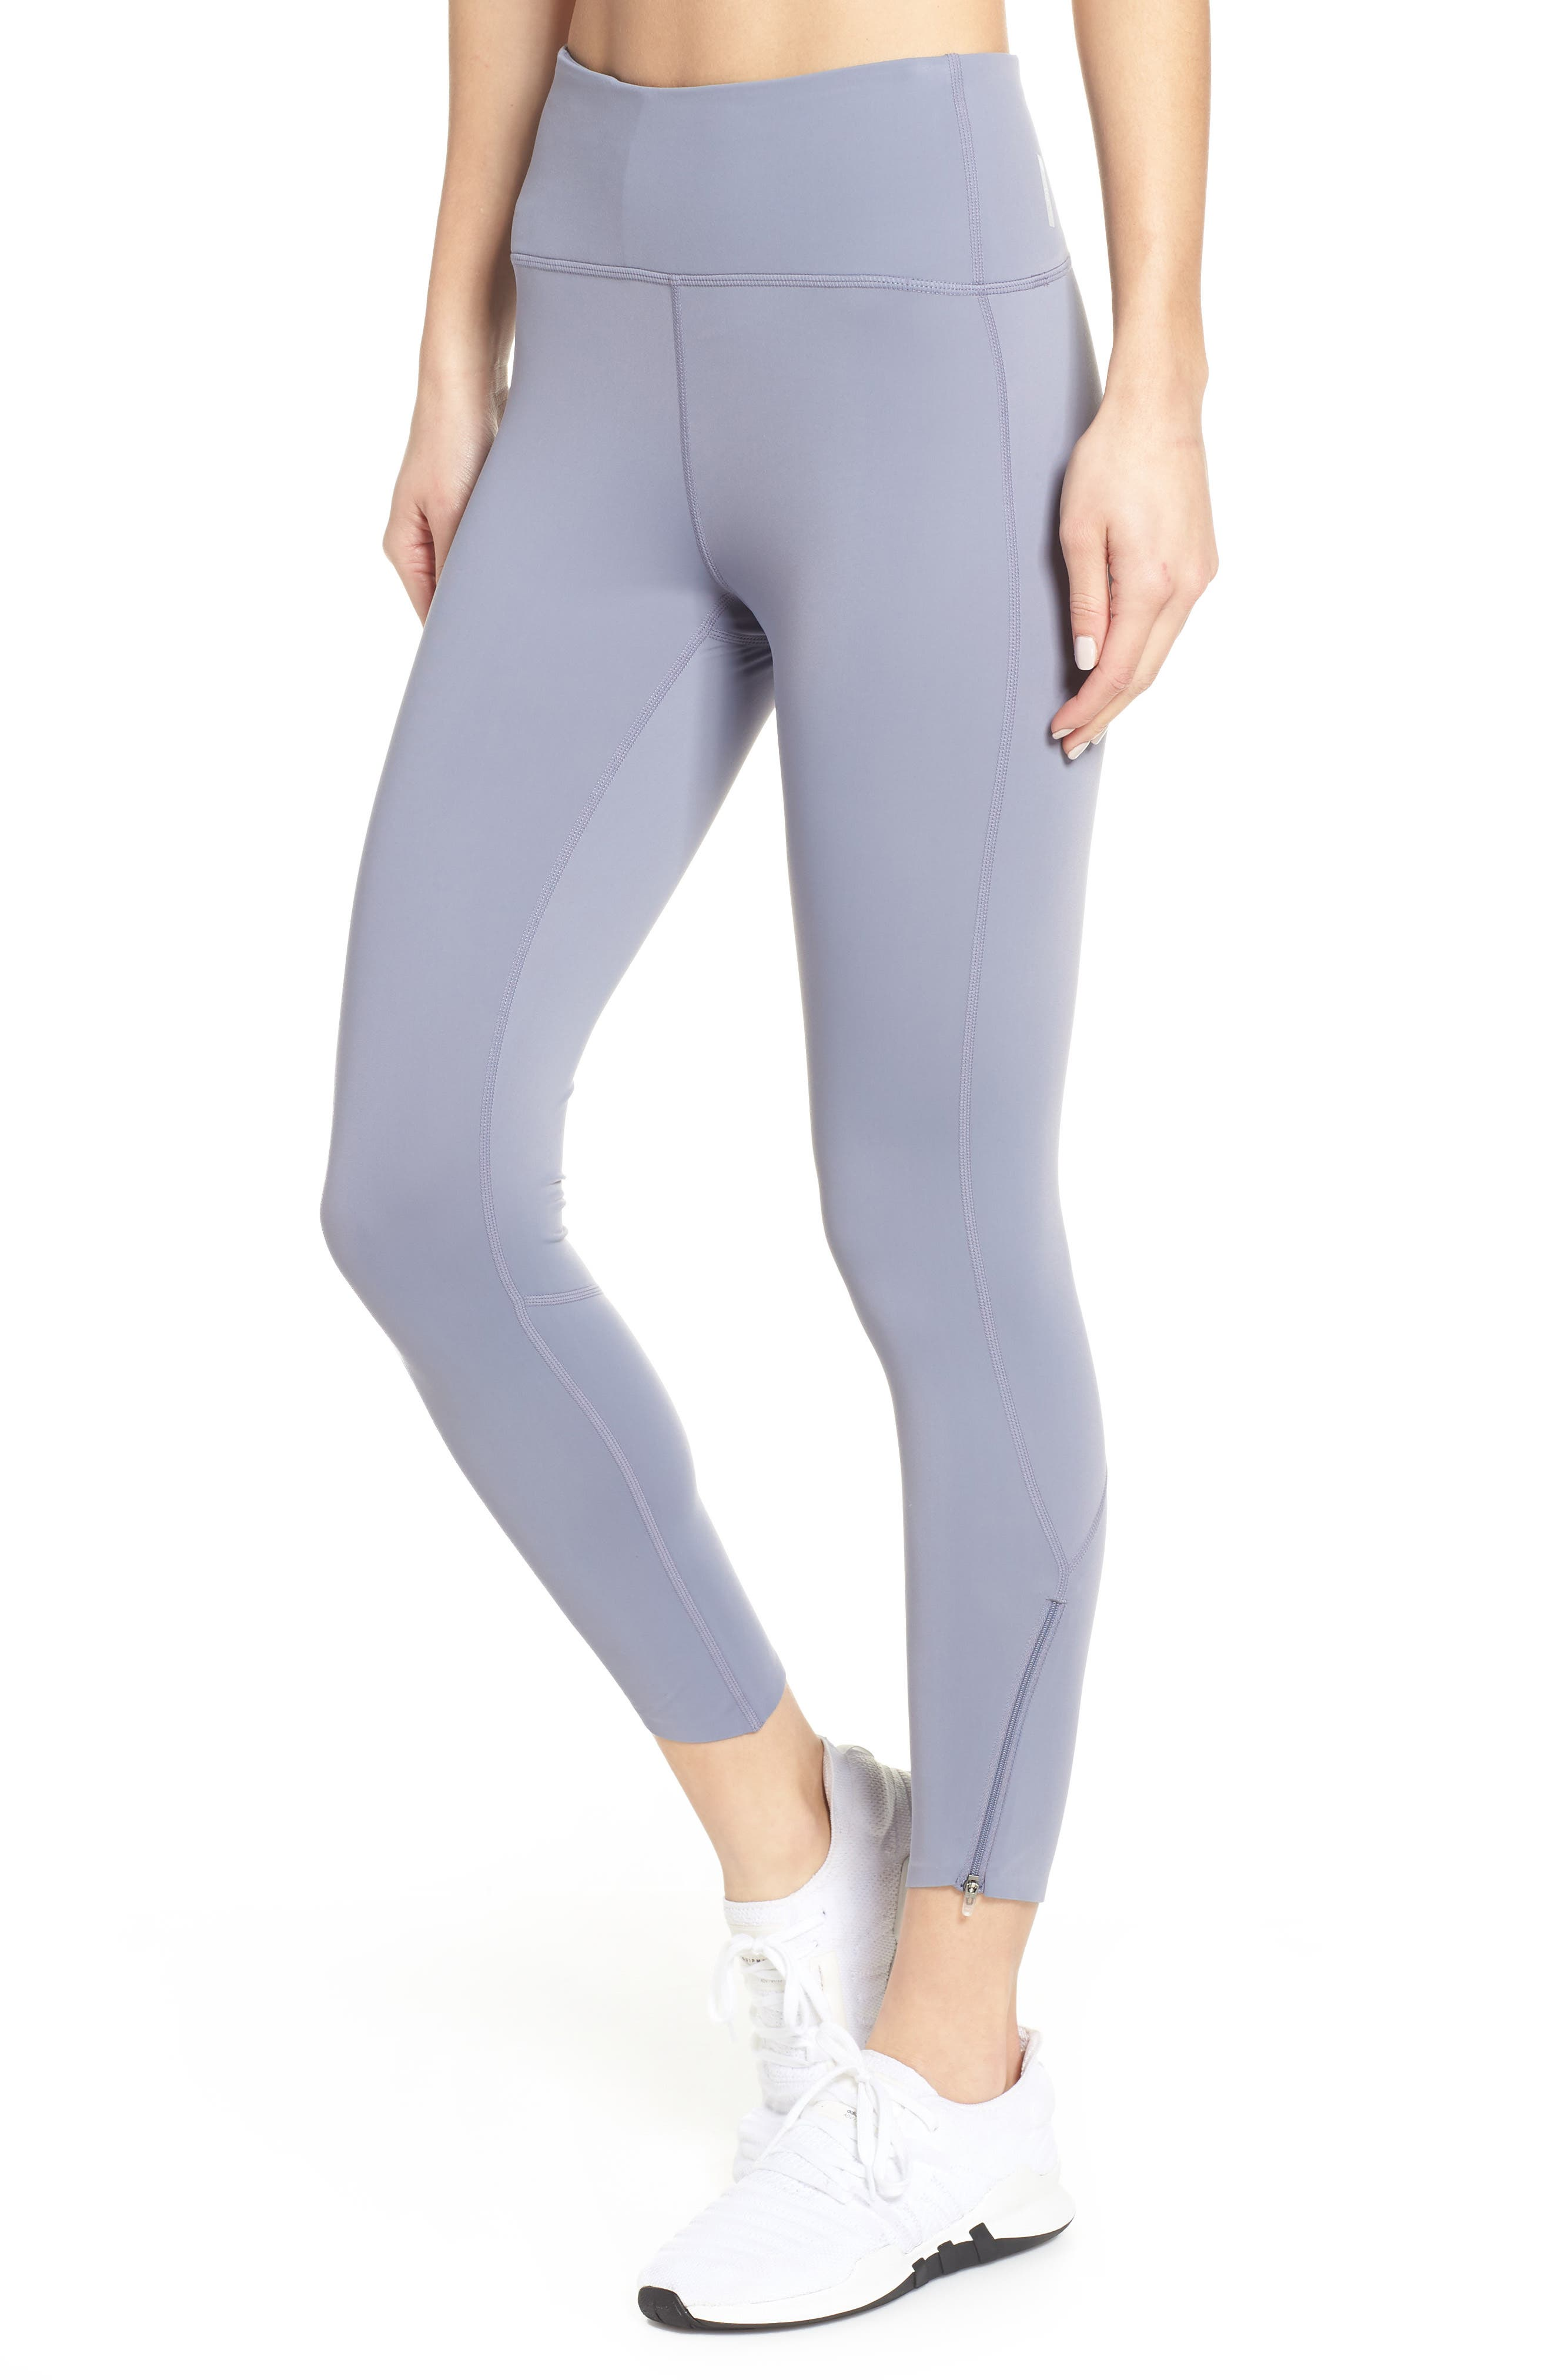 ZELLA Luella Luxe High Waist 7/8 Leggings, Main, color, GREY GRANITE